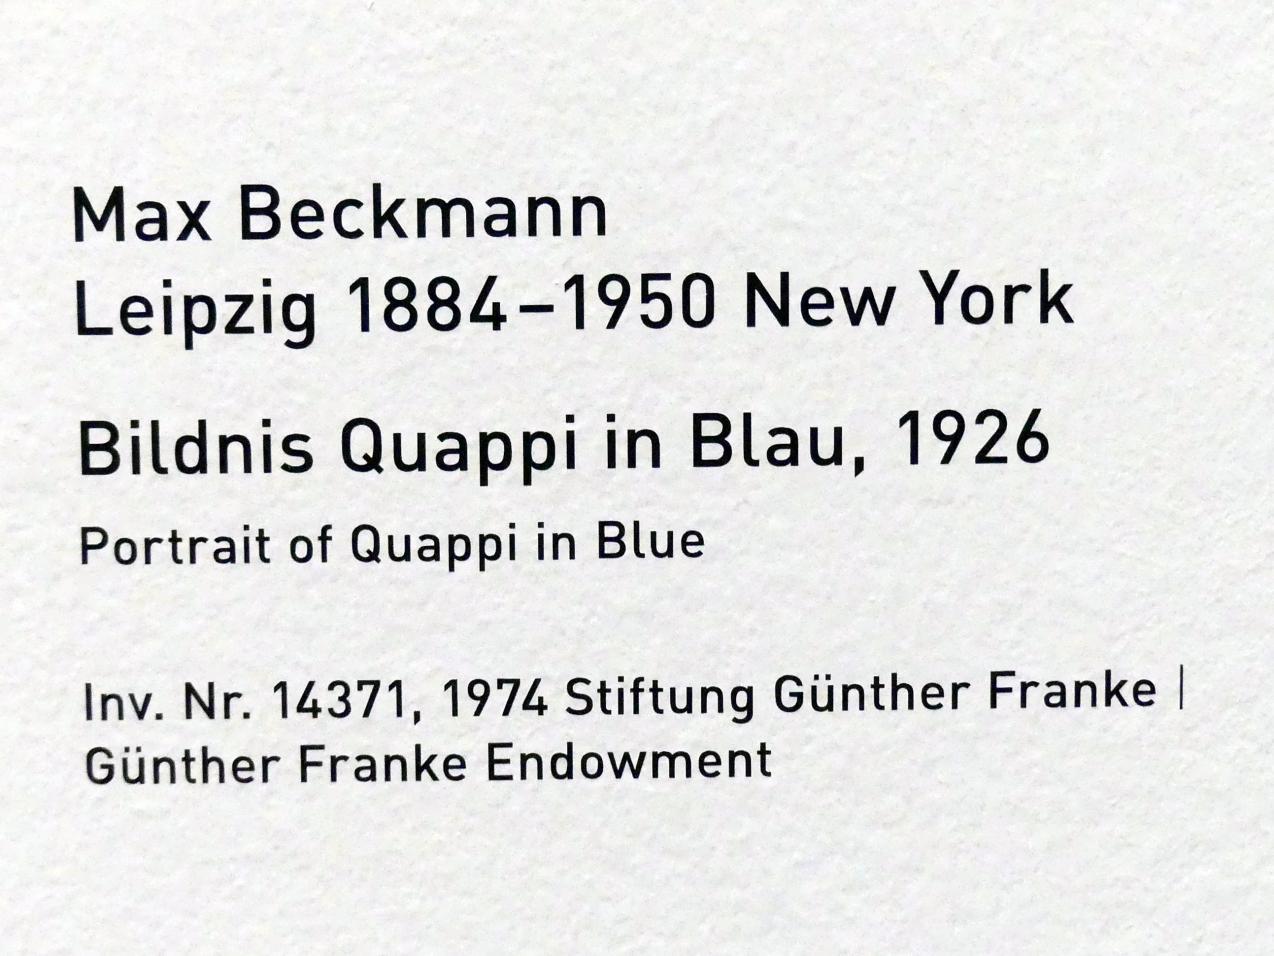 Max Beckmann: Bildnis Quappi in Blau, 1926, Bild 2/2